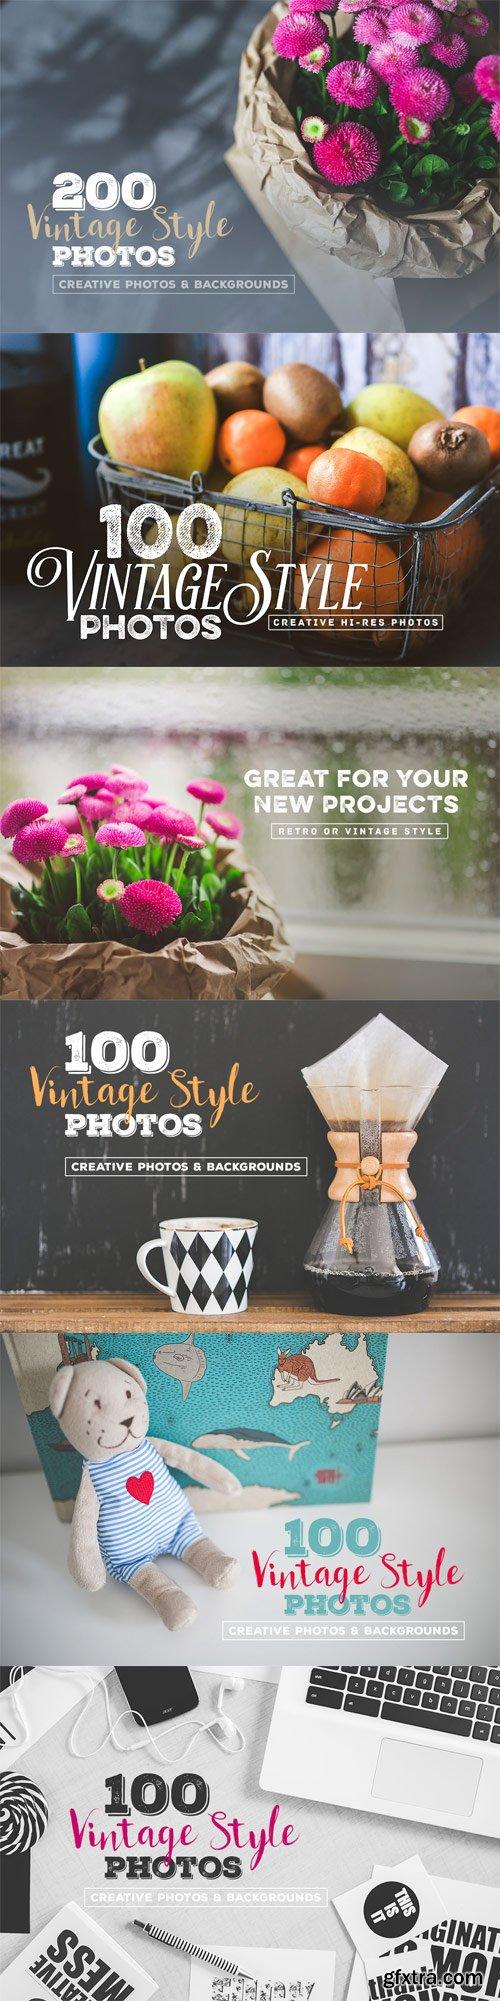 Vintage Style Photos